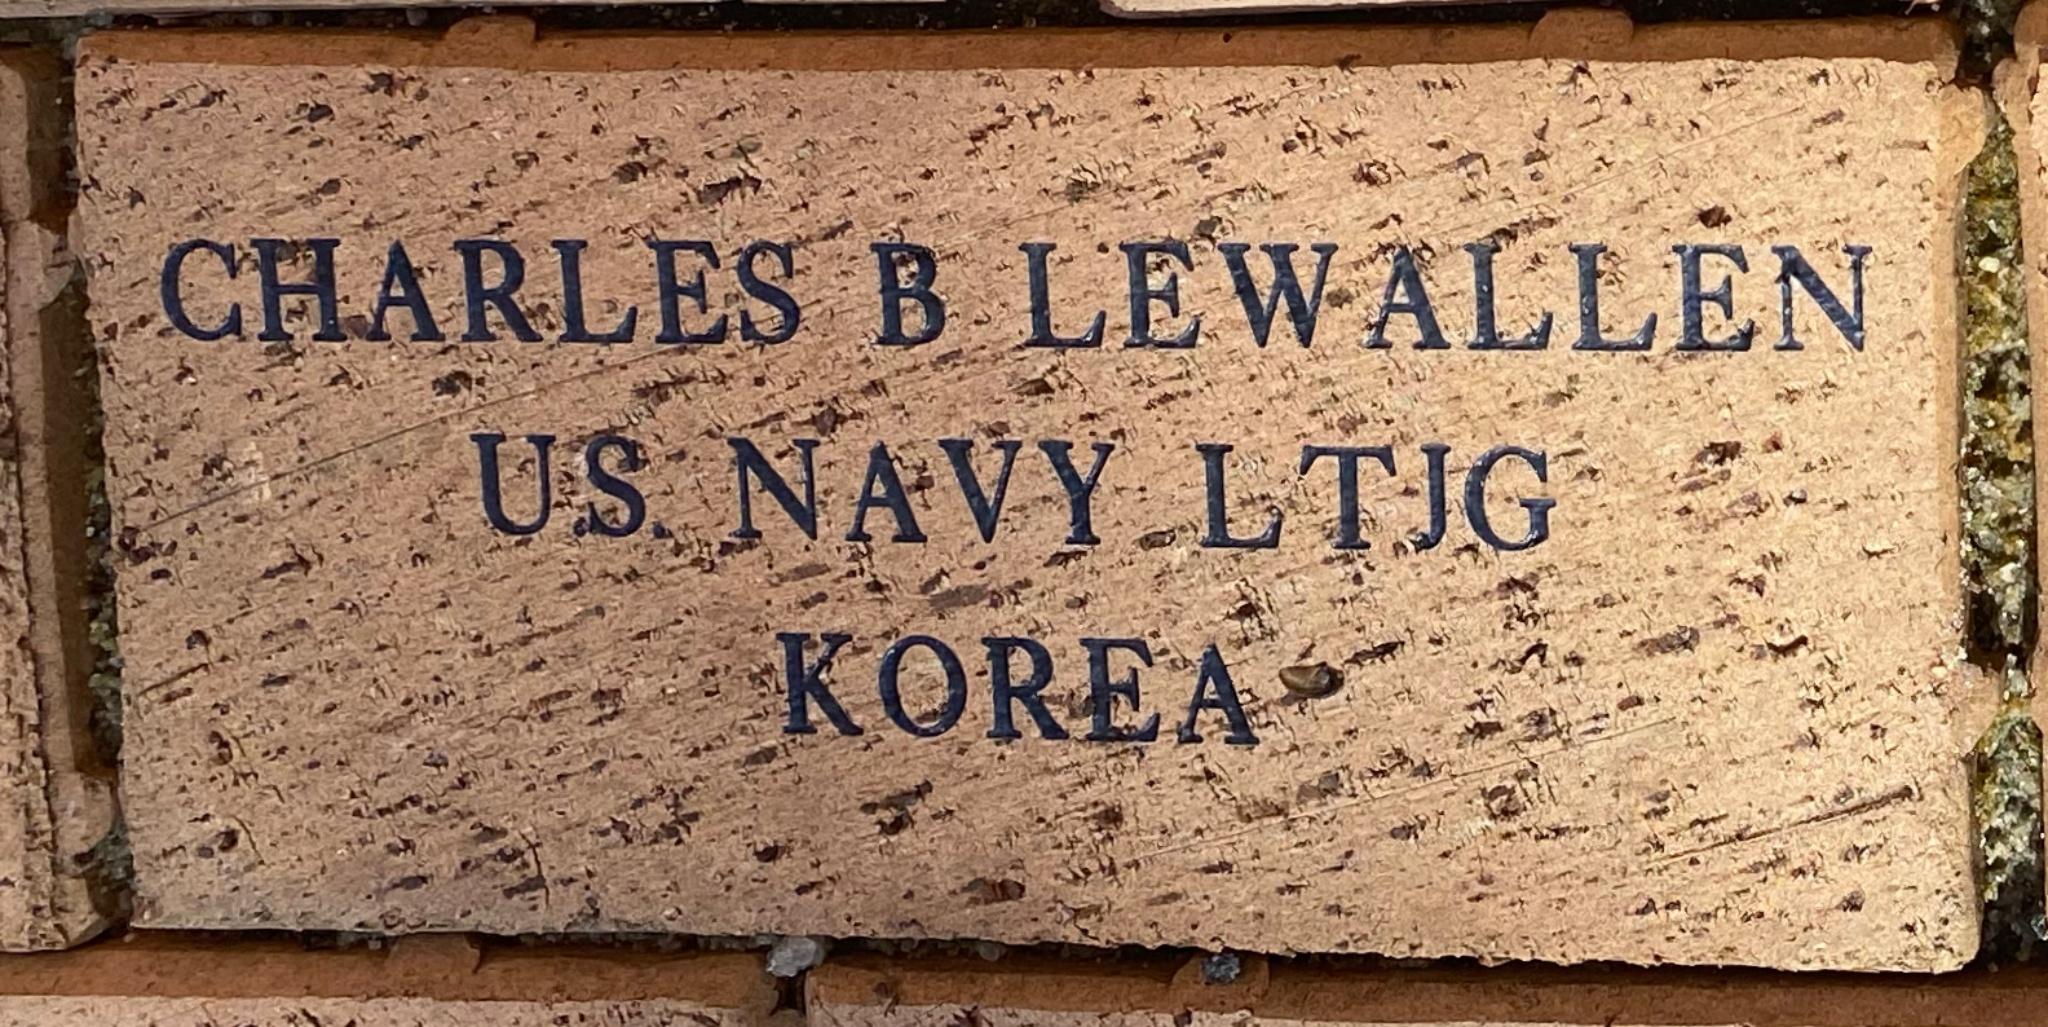 CHARLES B LEWALLEN US NAVY LTJG KOREA